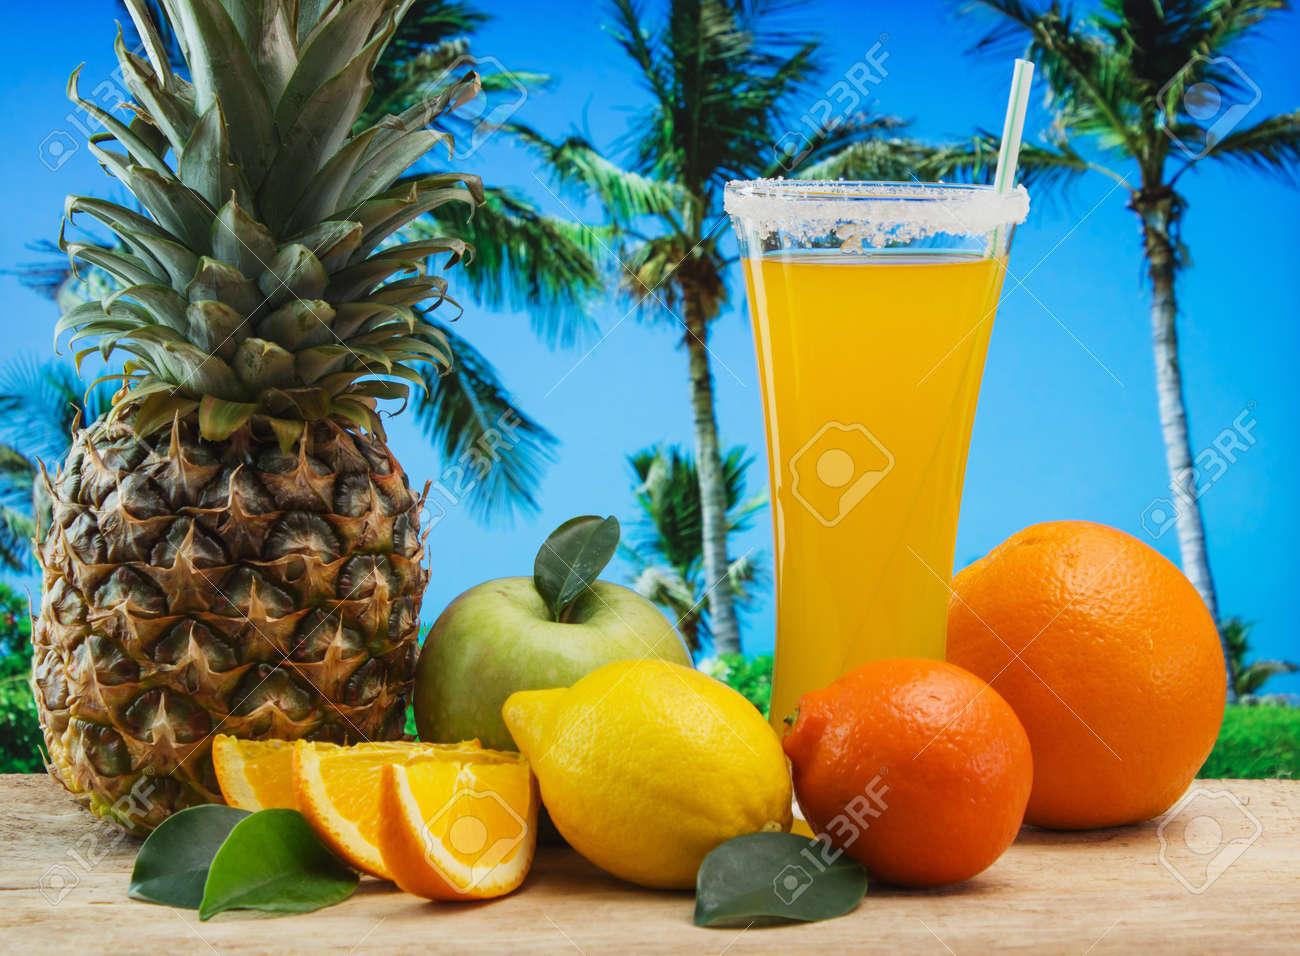 Glass of orange juice on a beach table - 18920564